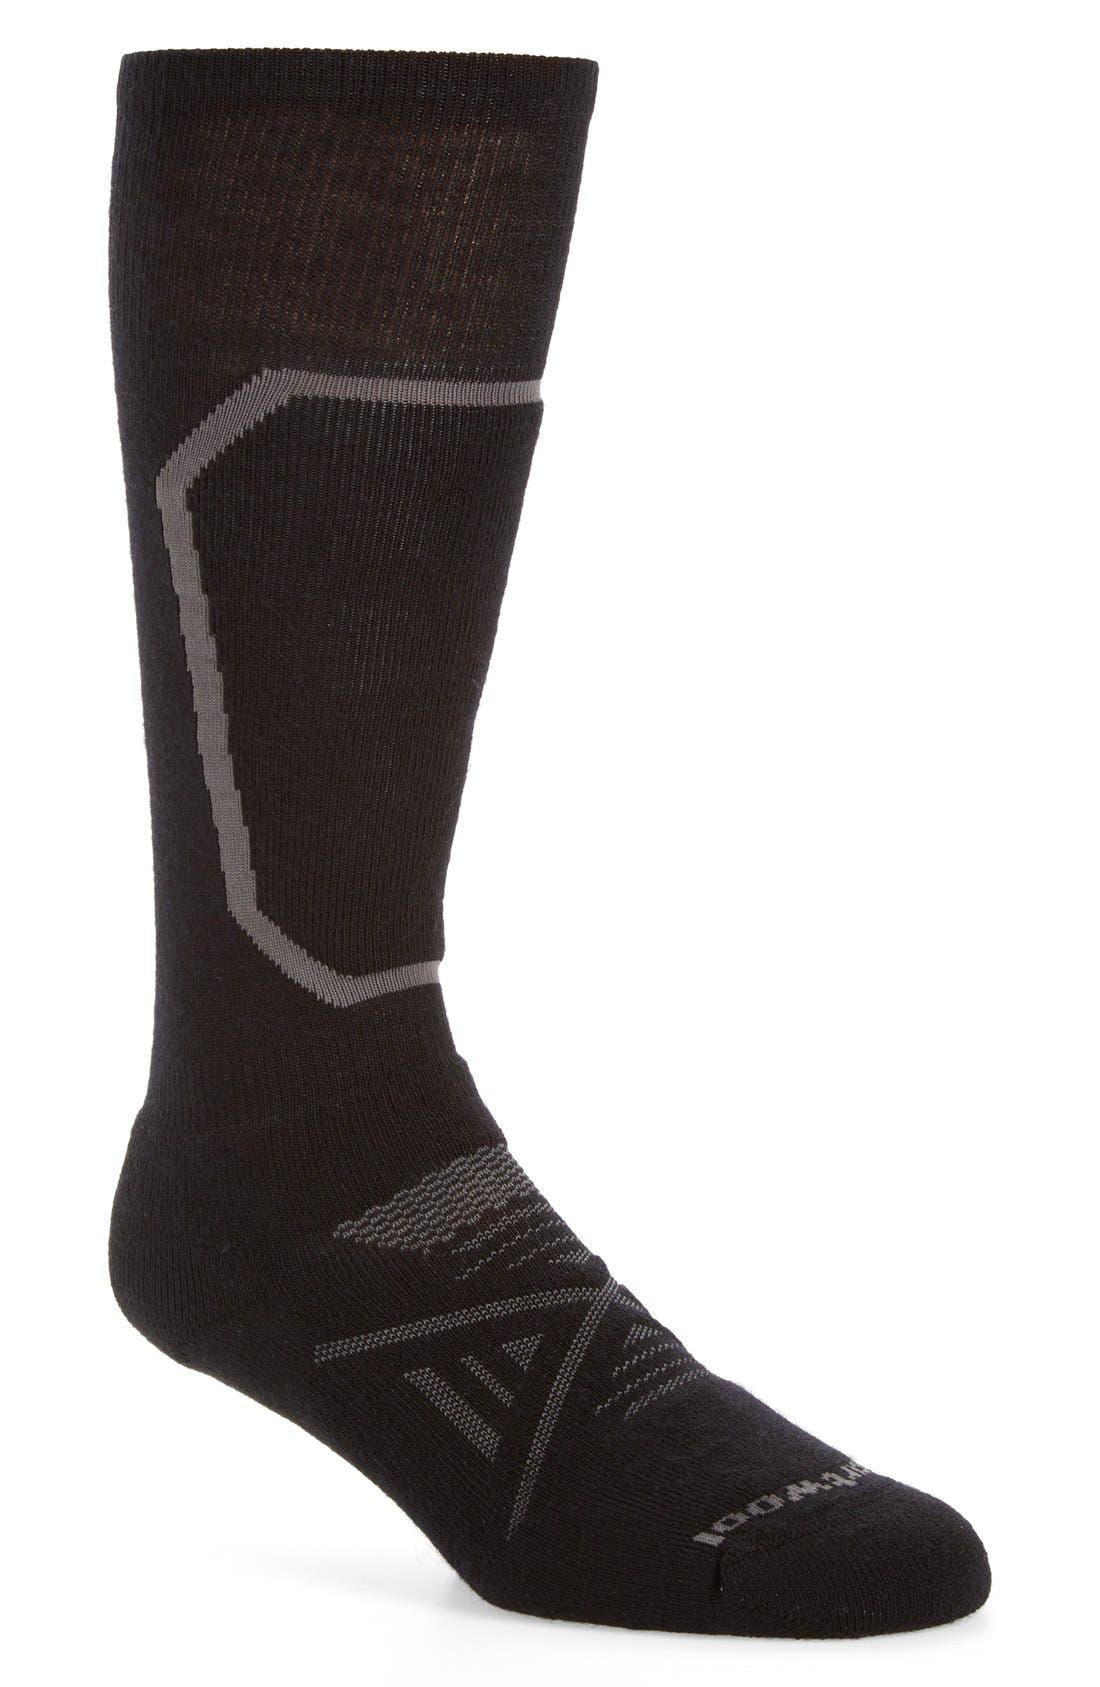 PhD<sup>®</sup> Ski Medium Over the Calf Socks,                         Main,                         color, 001